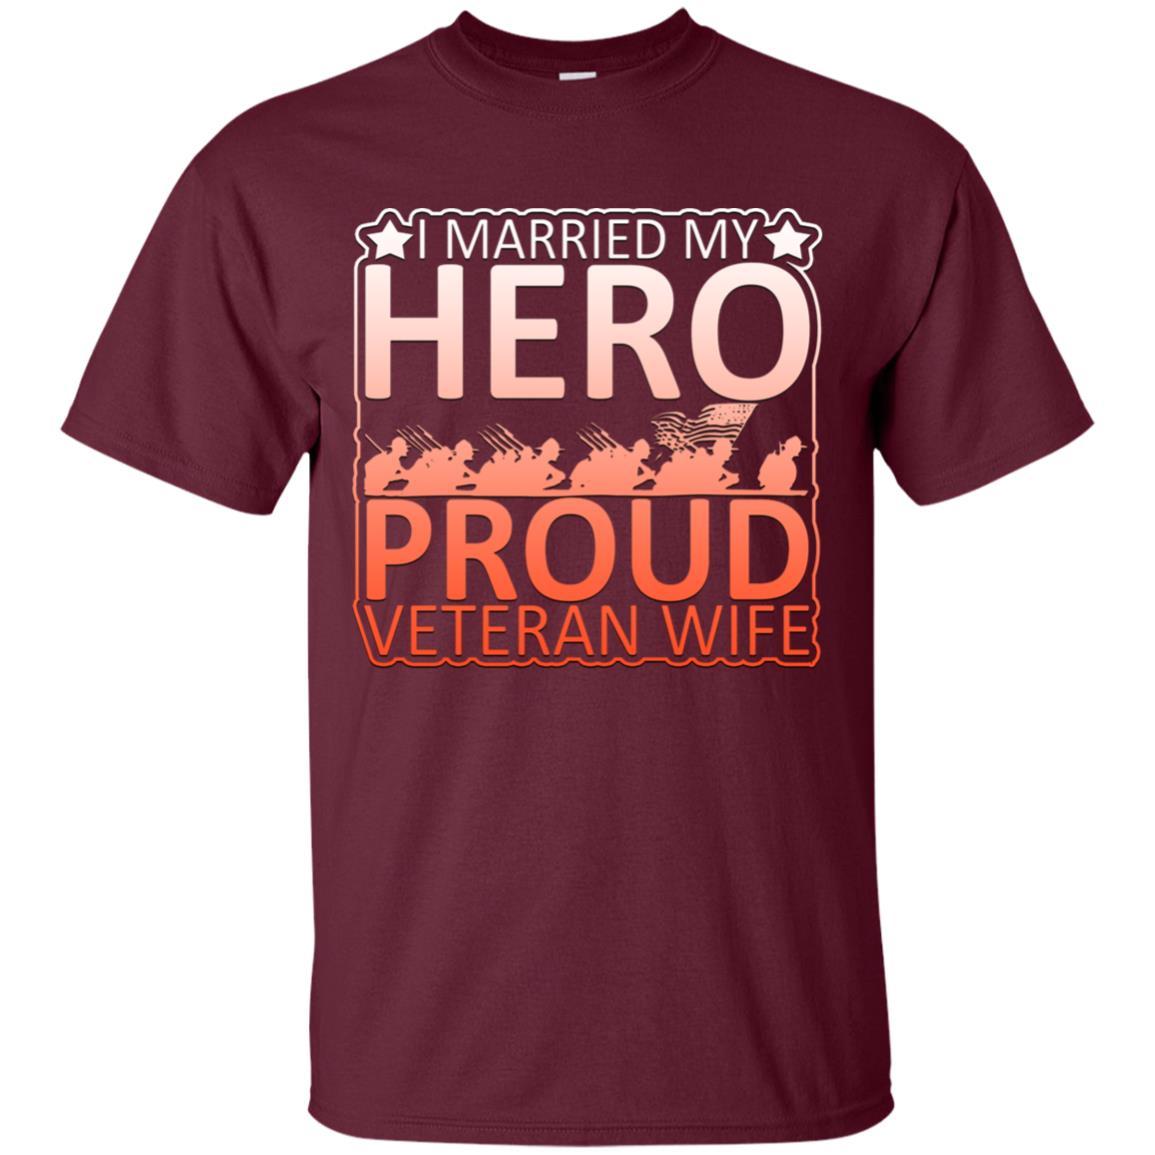 I Married My Hero Proud Veteran's Wife Graphic Unisex Short Sleeve